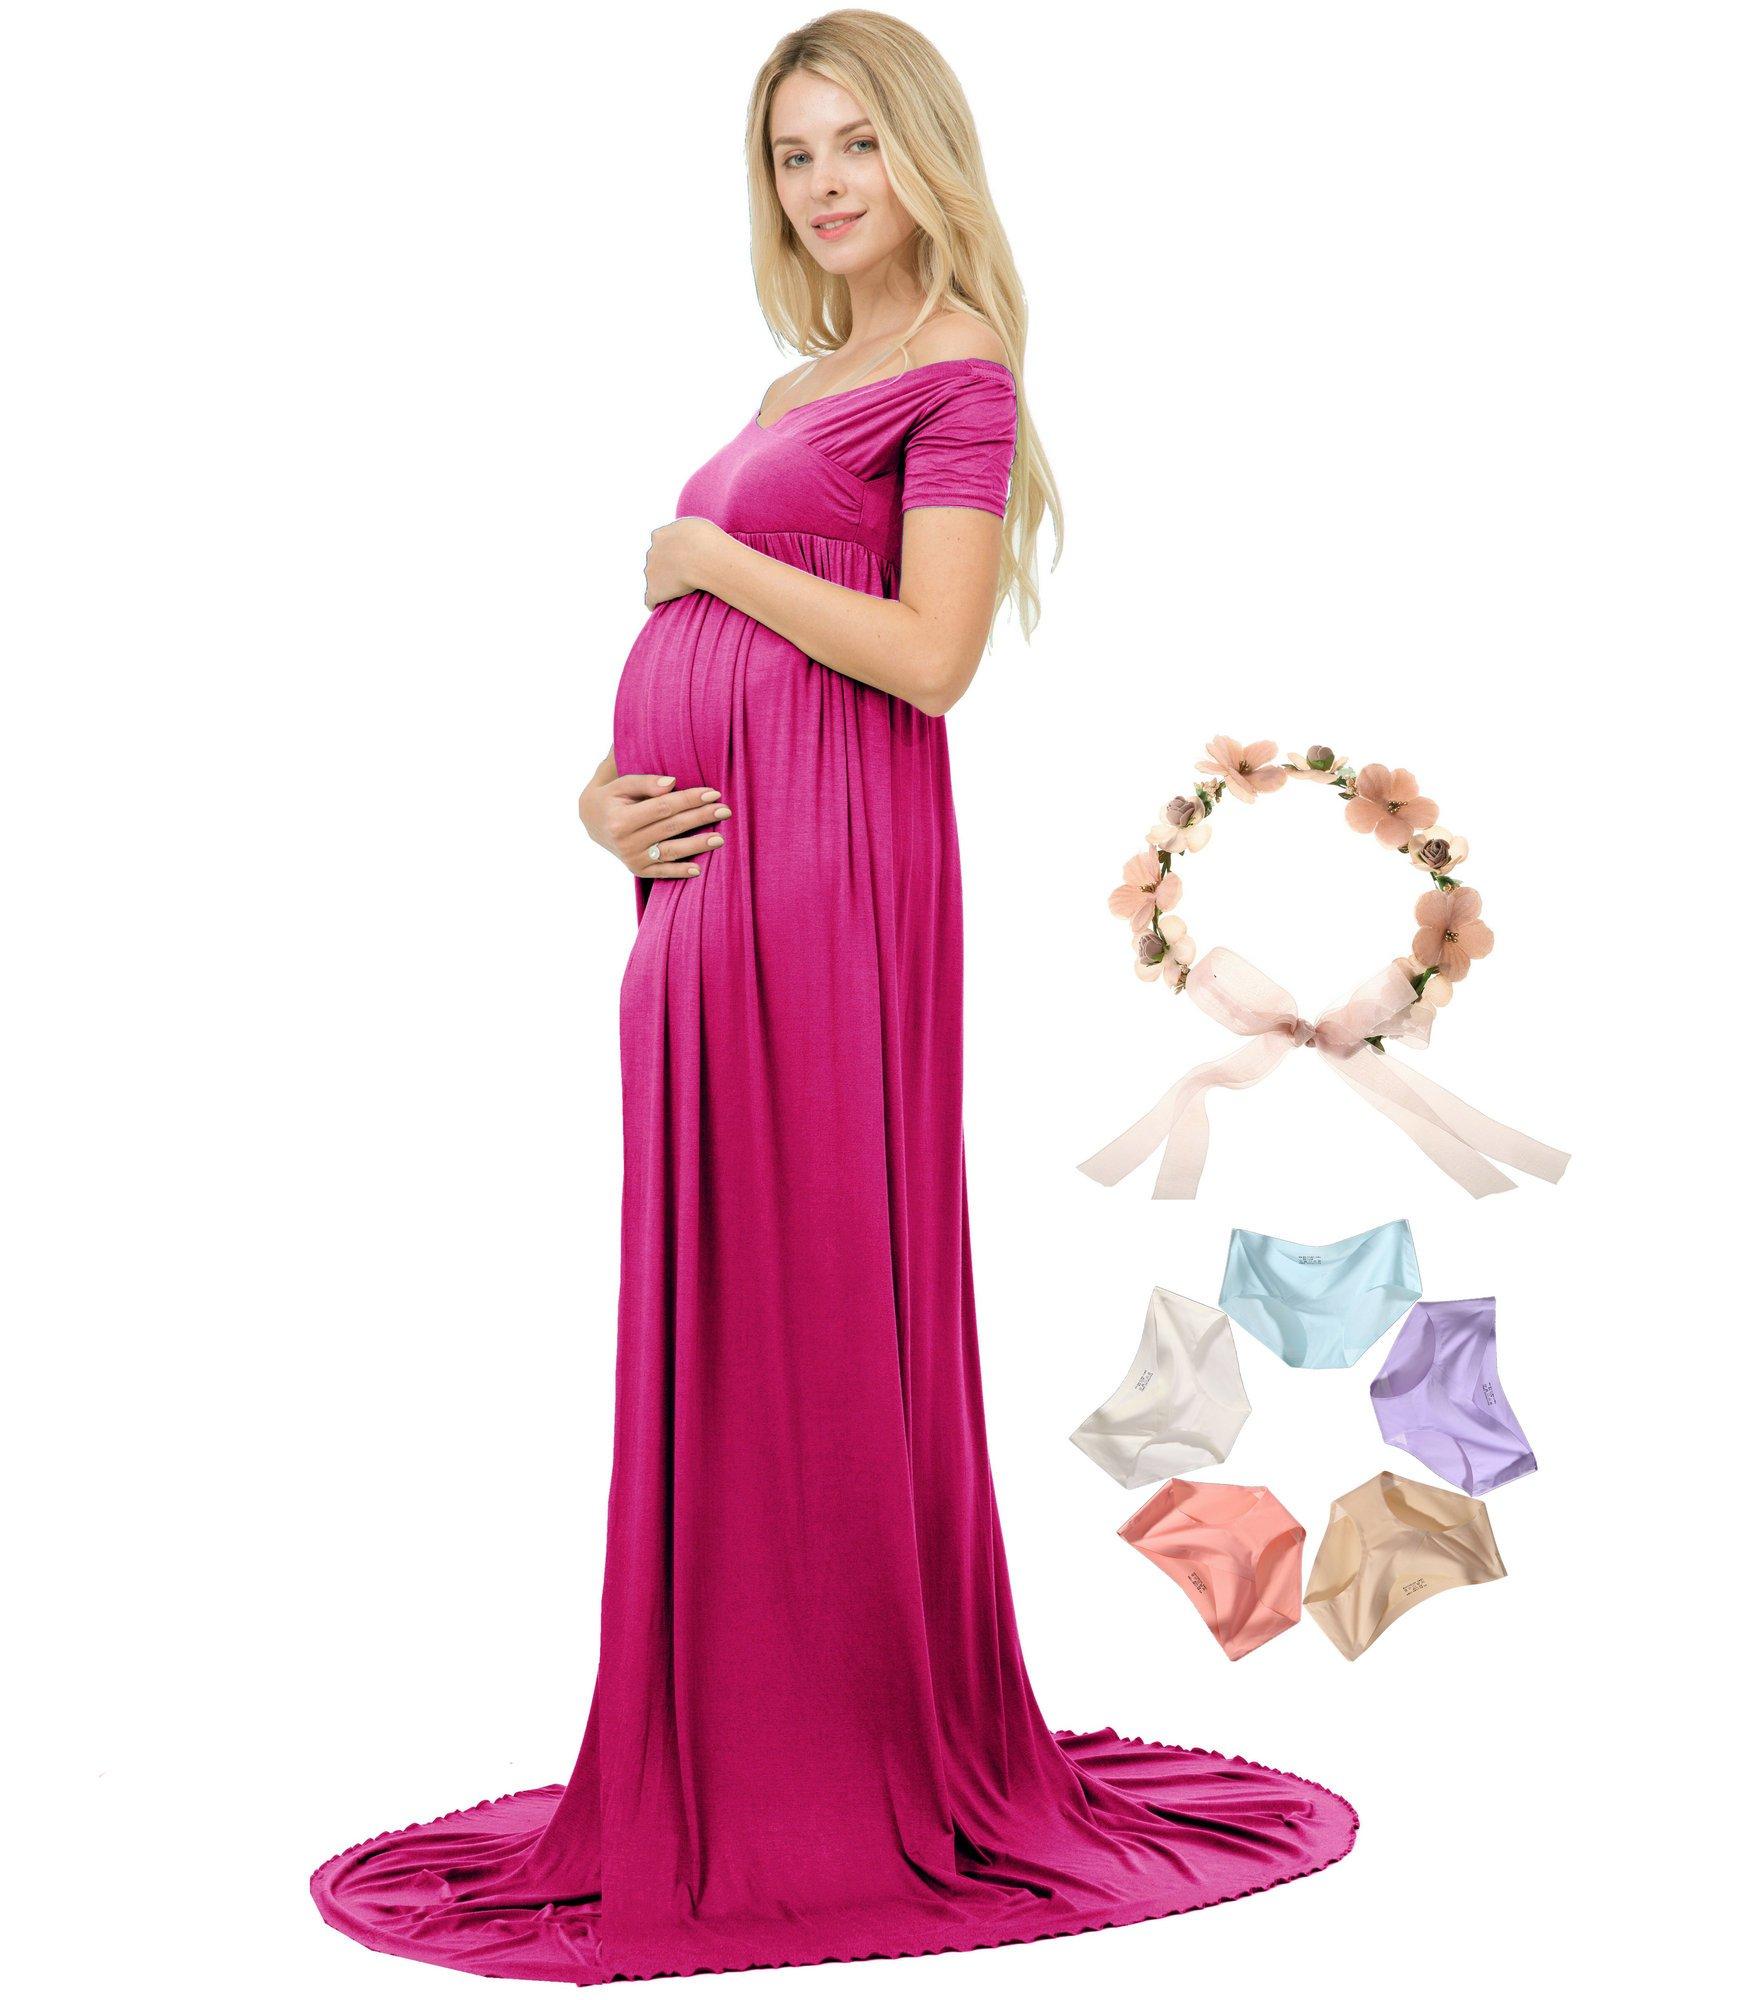 Photoshoot Maternity Dress V-Neck Short Sleeve Off Shoulder Photography MaxiGown (Magenta)